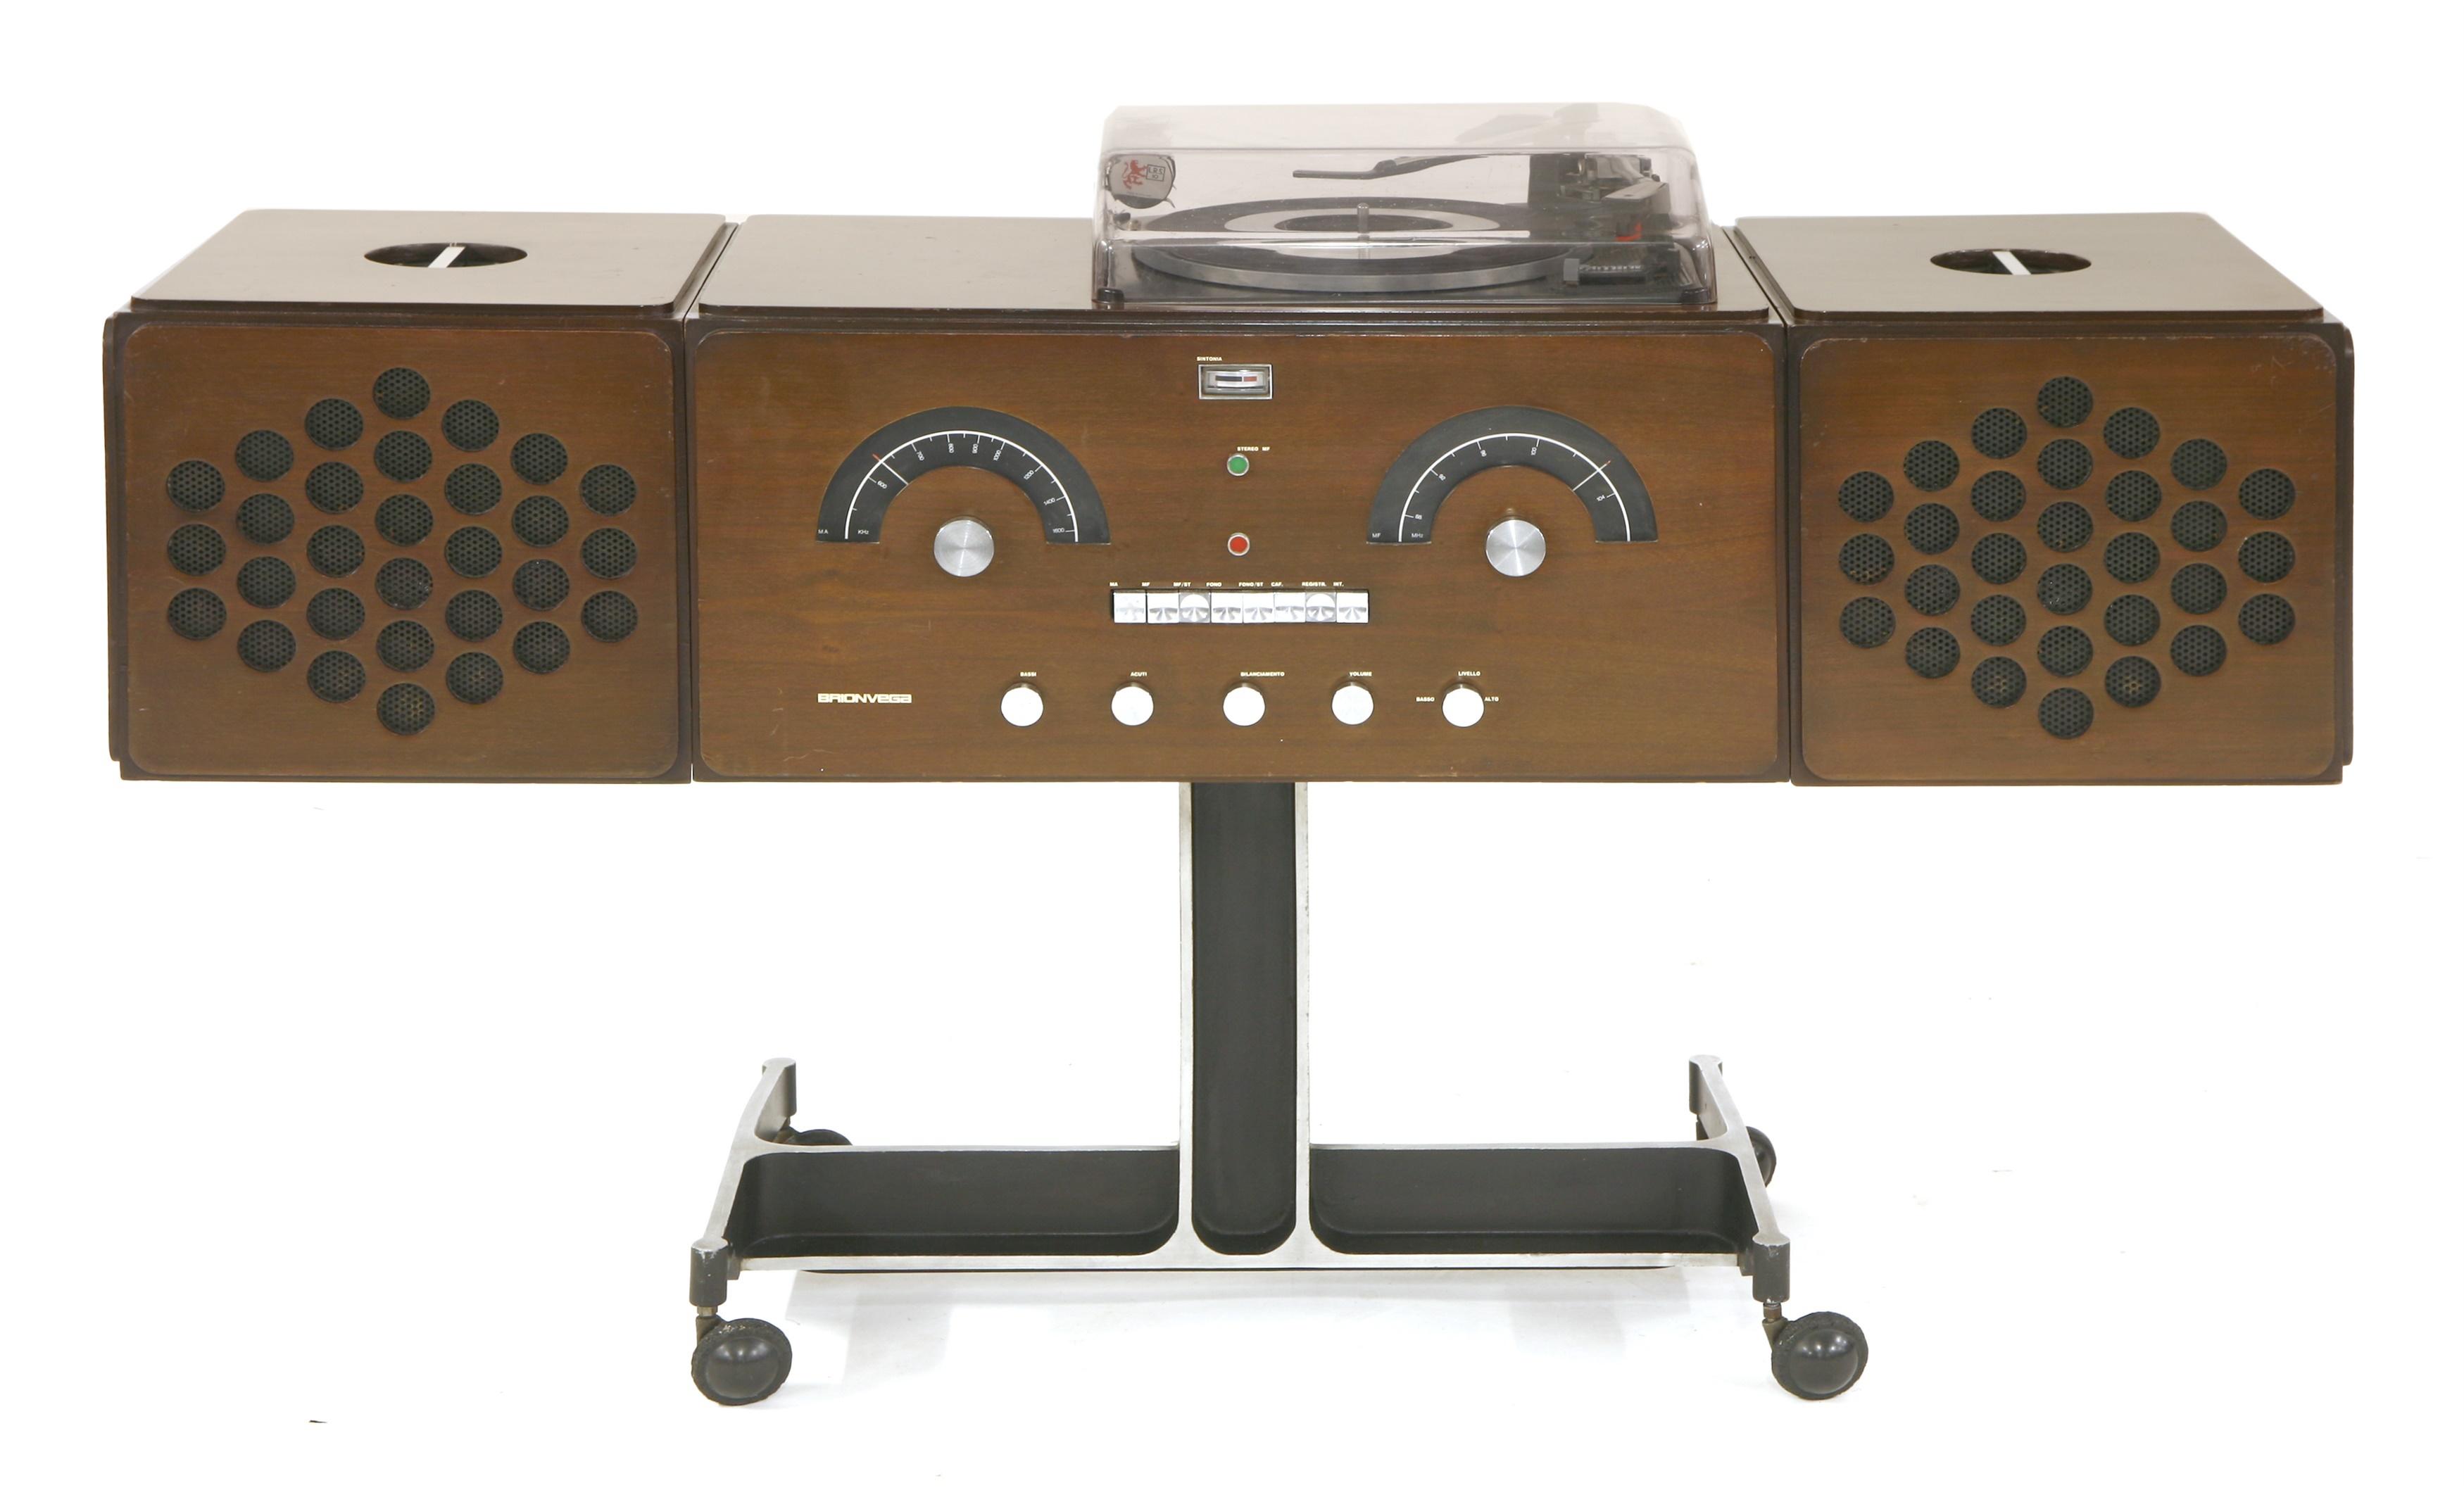 An RR126 Radiofonografo